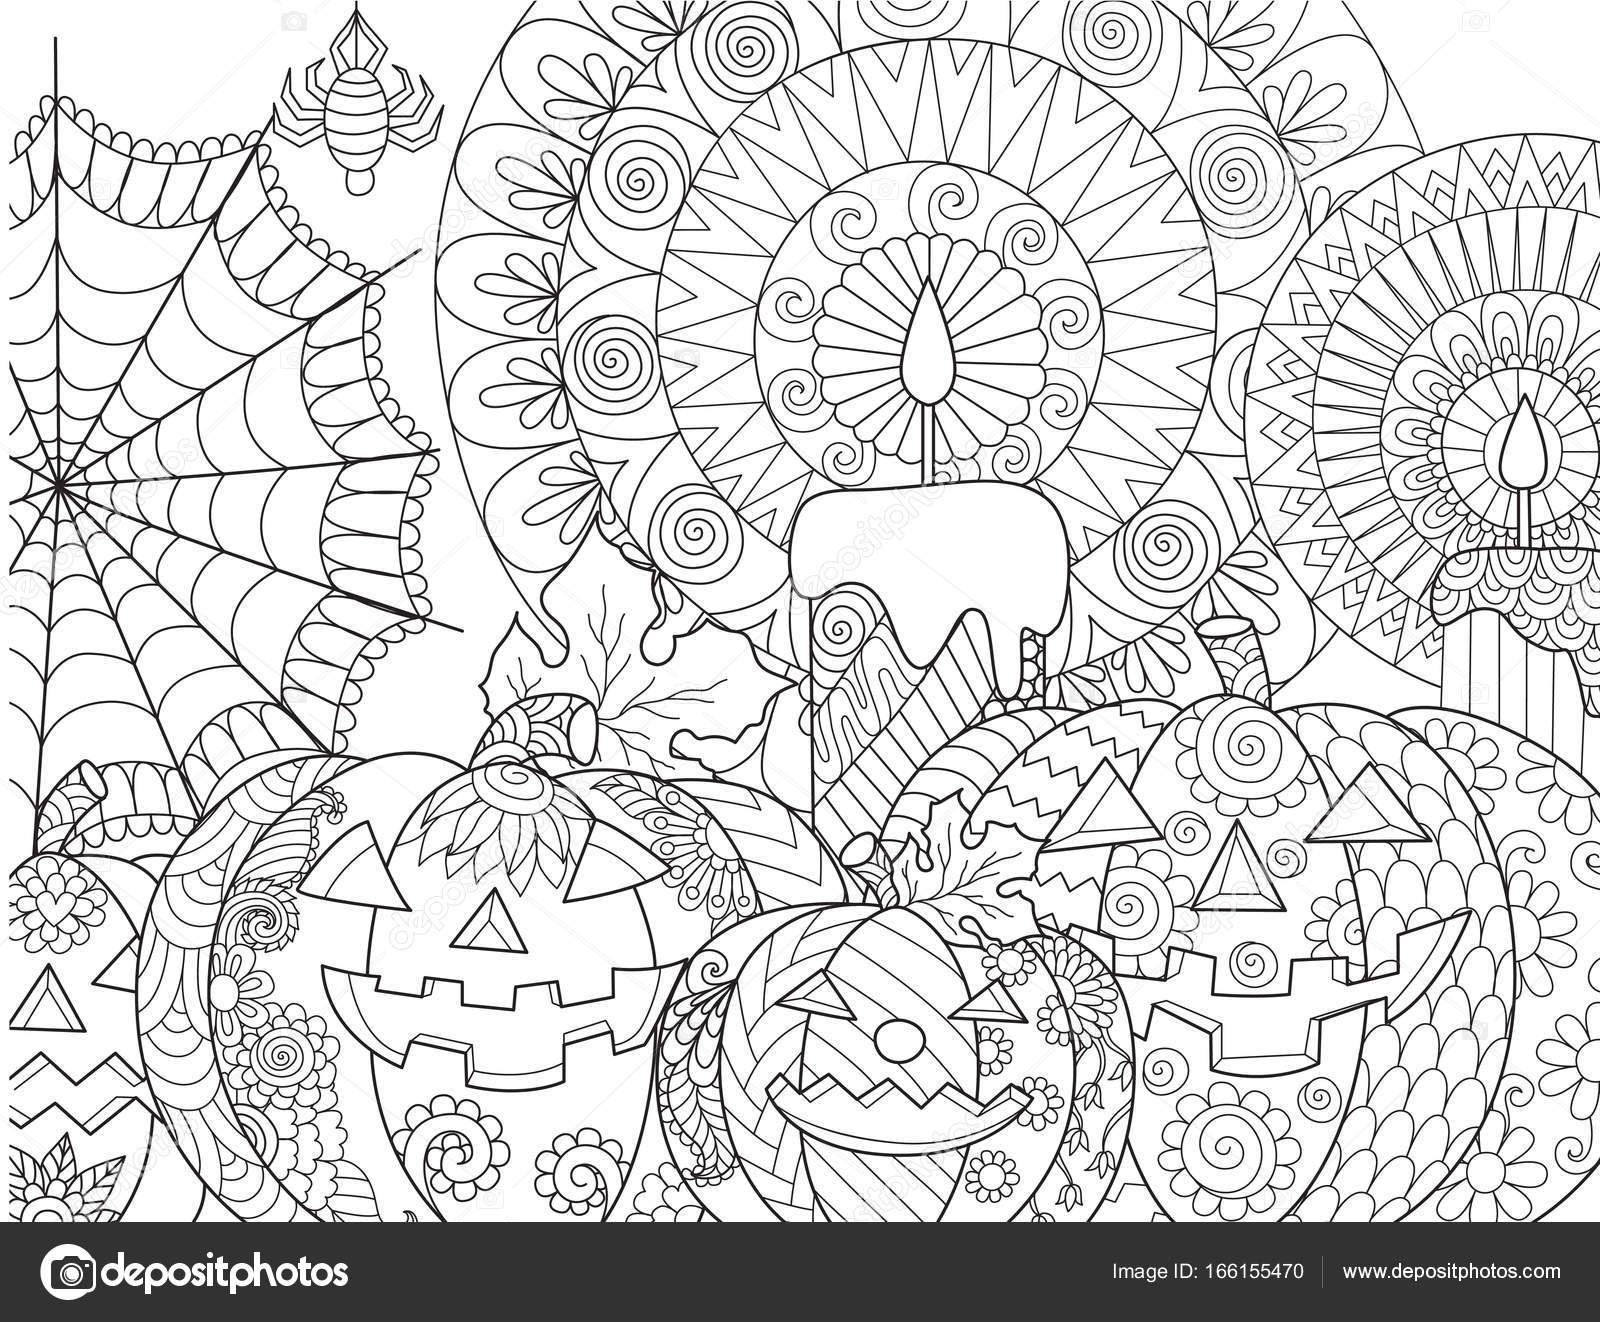 Halloween Kabak Boyama Stok Vektör Somjaicindy At Gmailcom 166155470